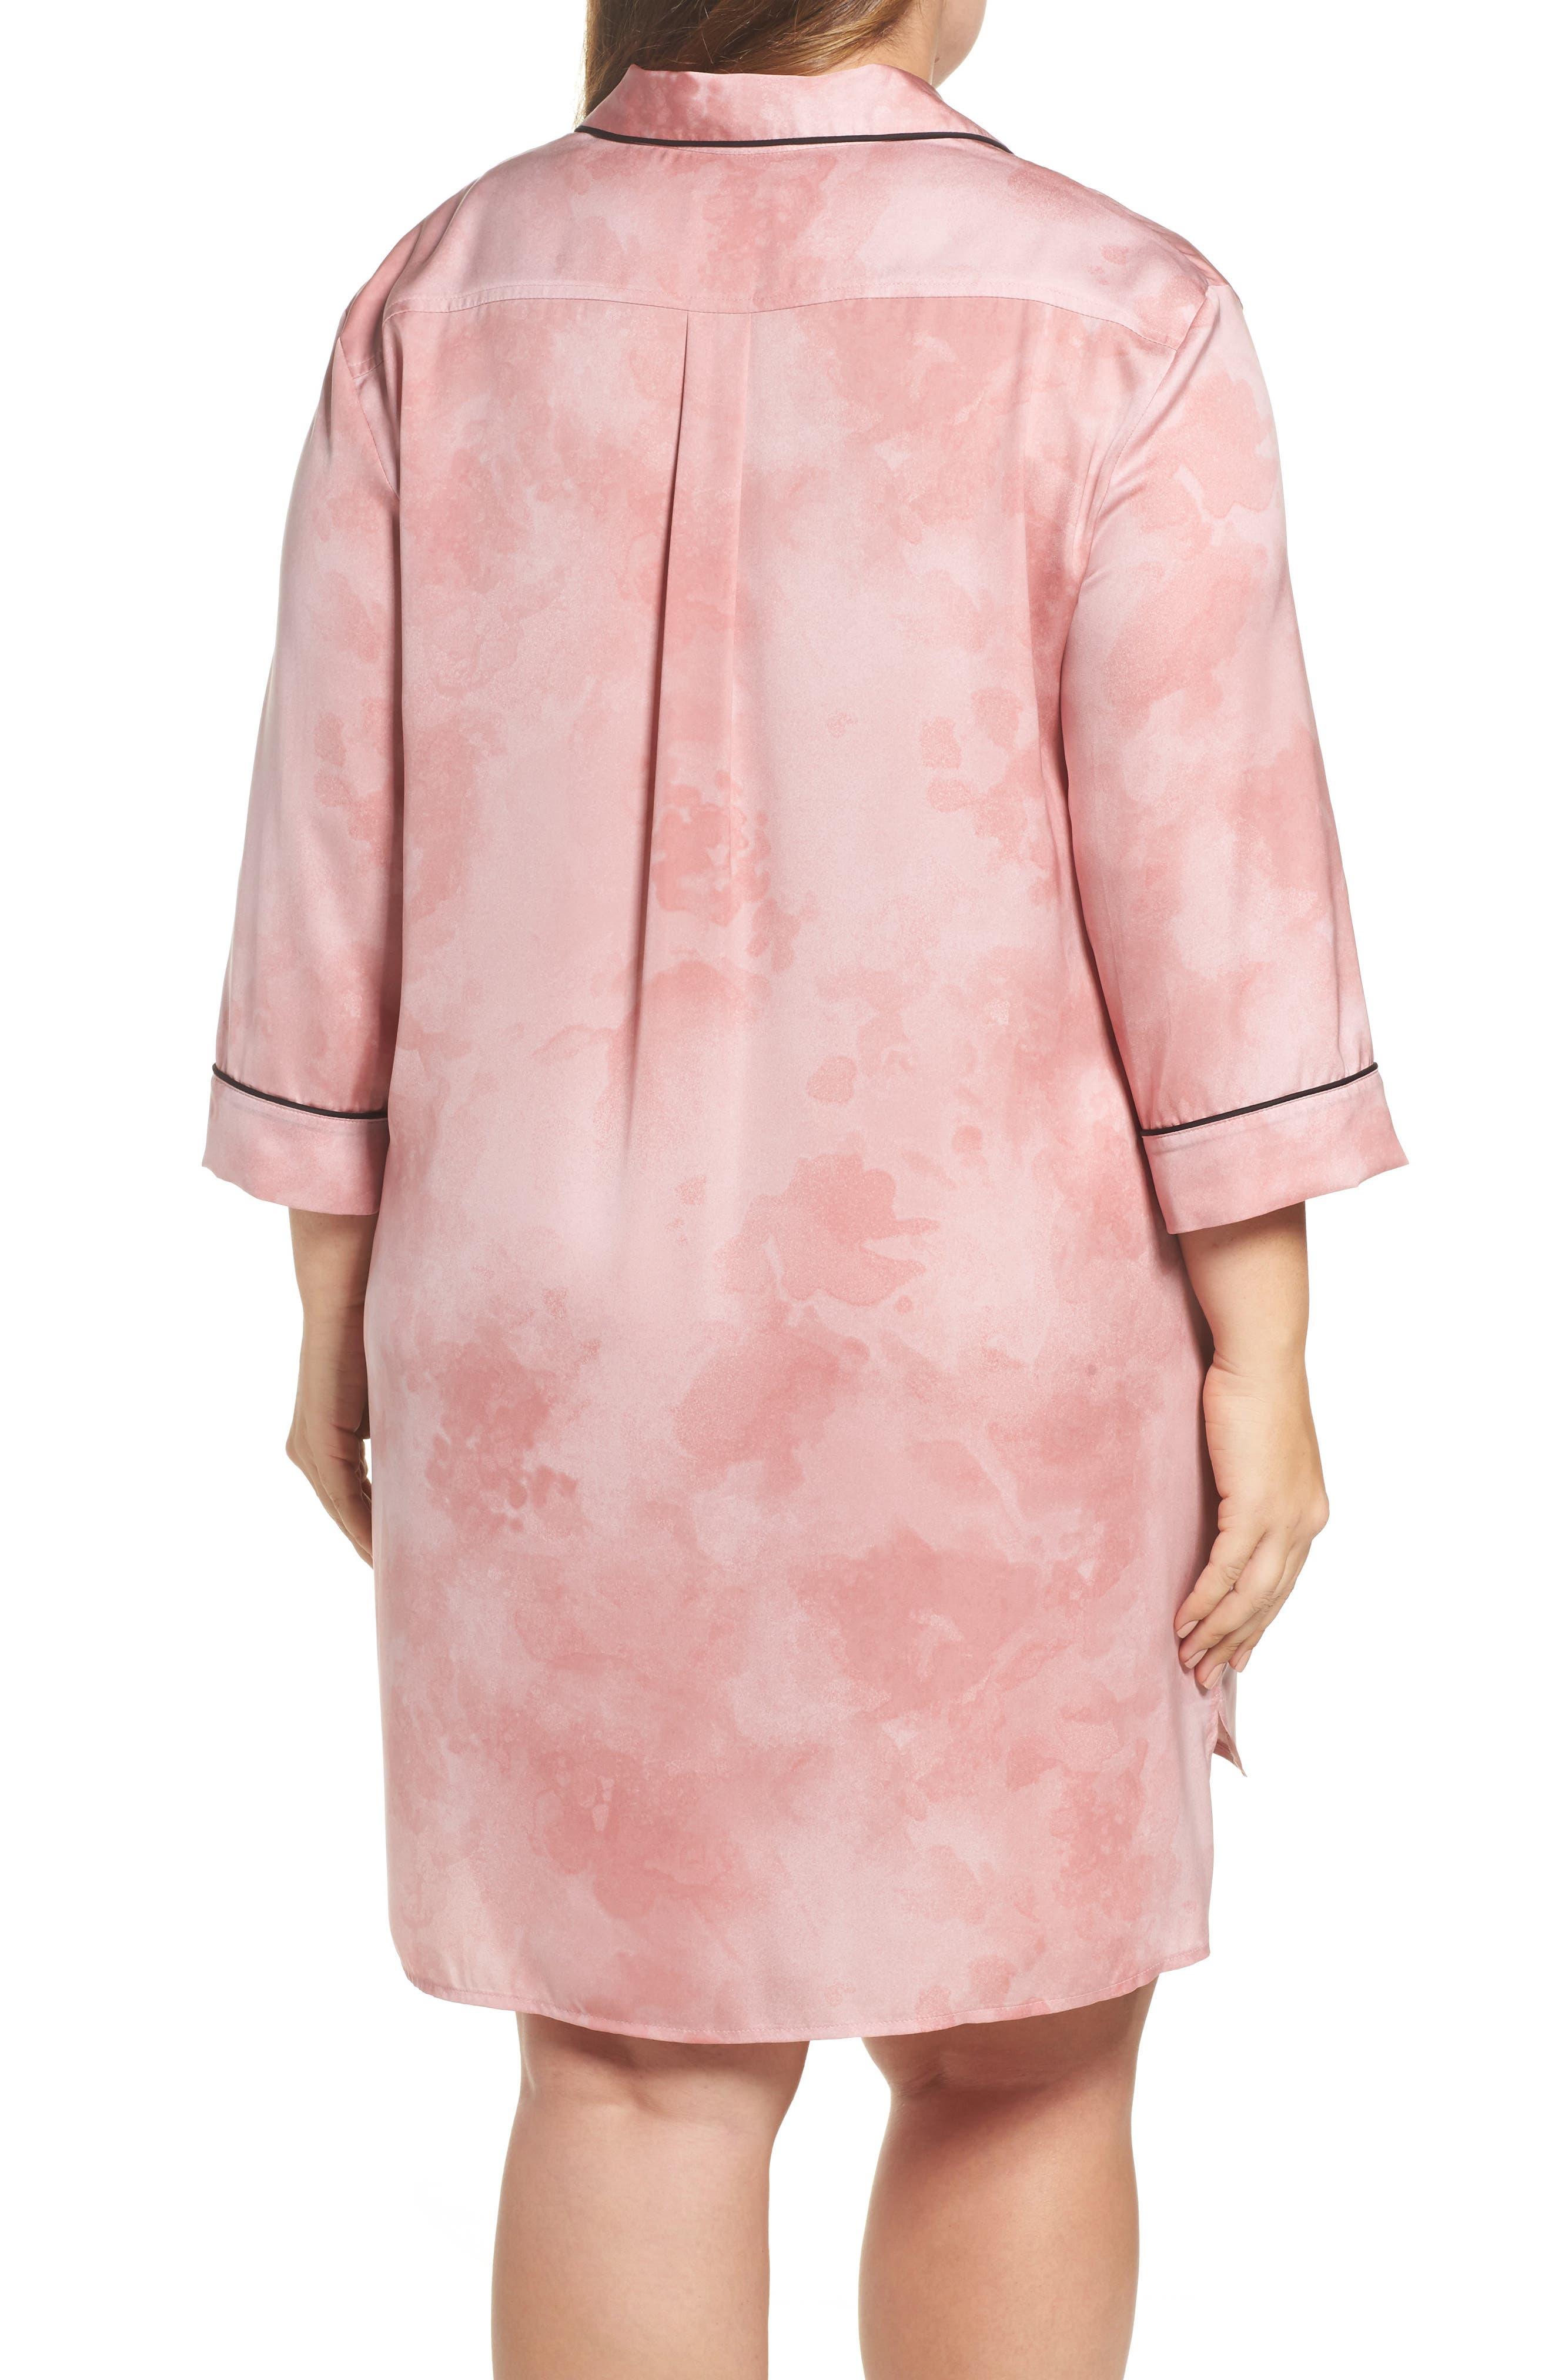 Washed Satin Sleep Shirt,                             Alternate thumbnail 2, color,                             Pink Floral